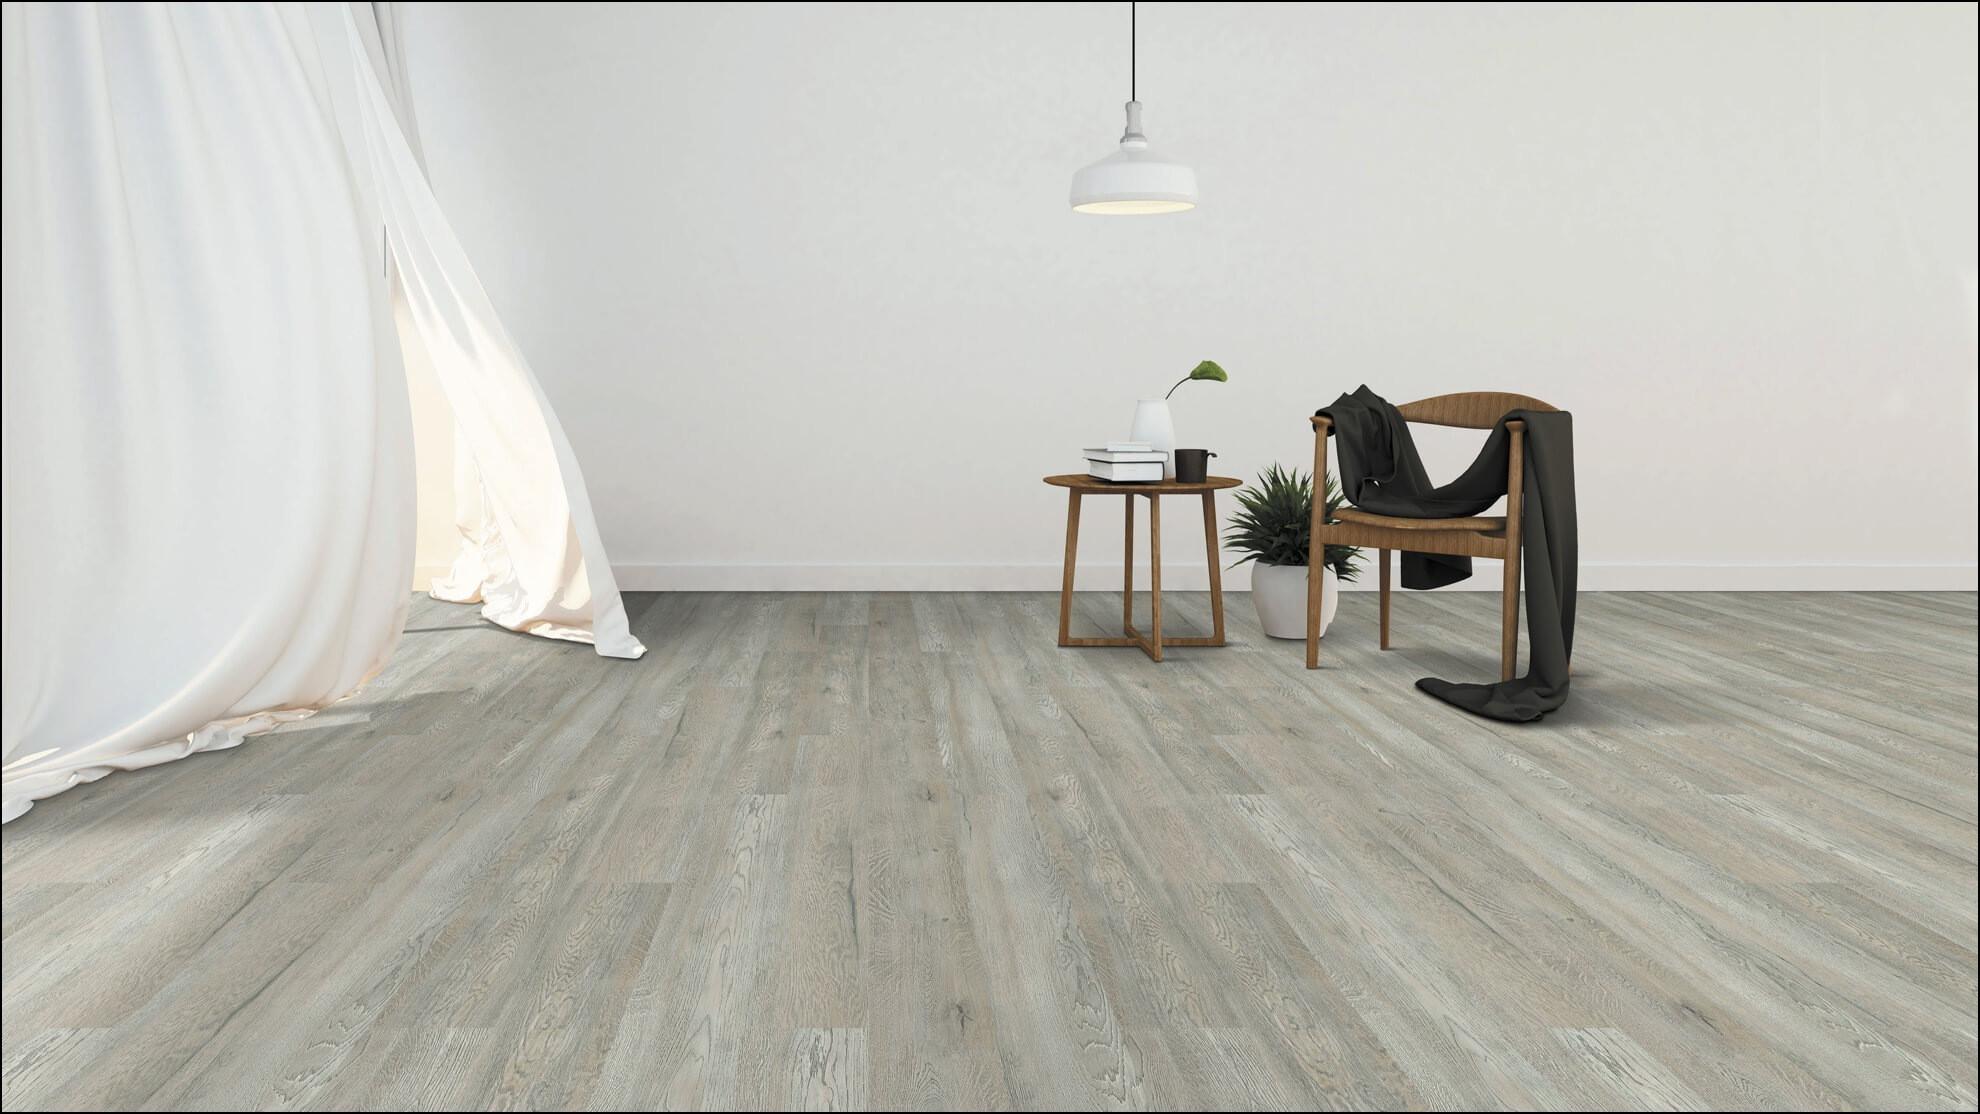 arizona hardwood floor supply reviews of hardwood flooring suppliers france flooring ideas within hardwood flooring installation san diego collection earthwerks flooring of hardwood flooring installation san diego